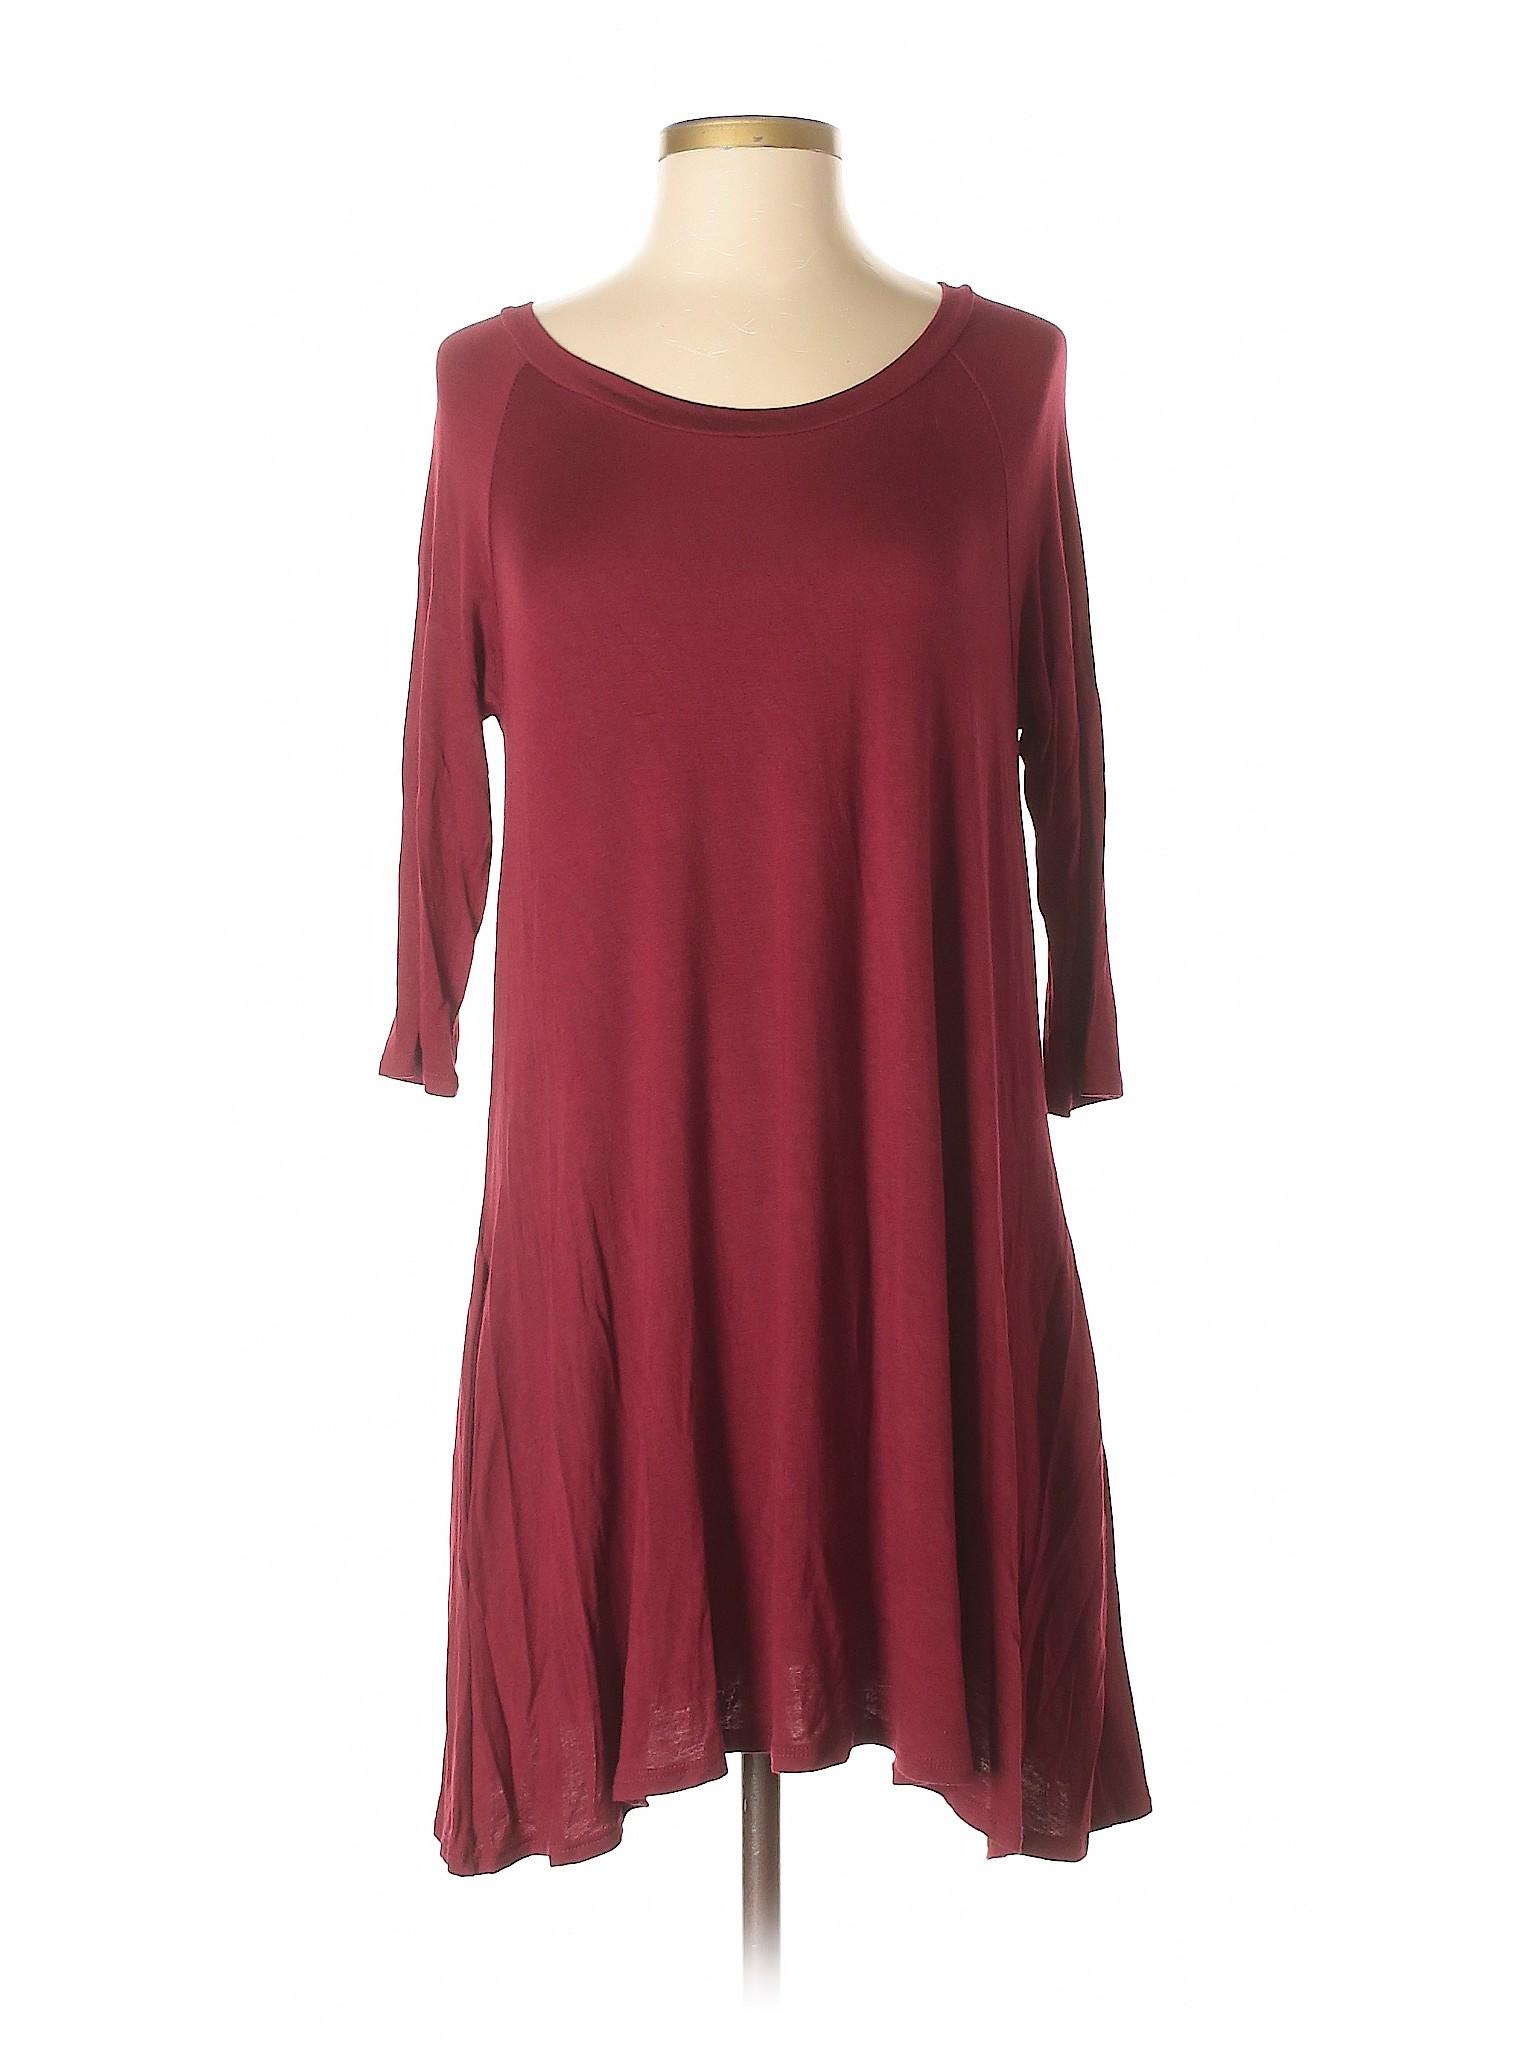 Boutique winter Eloges Casual winter Dress Dress Casual Eloges Boutique wwqHUOT